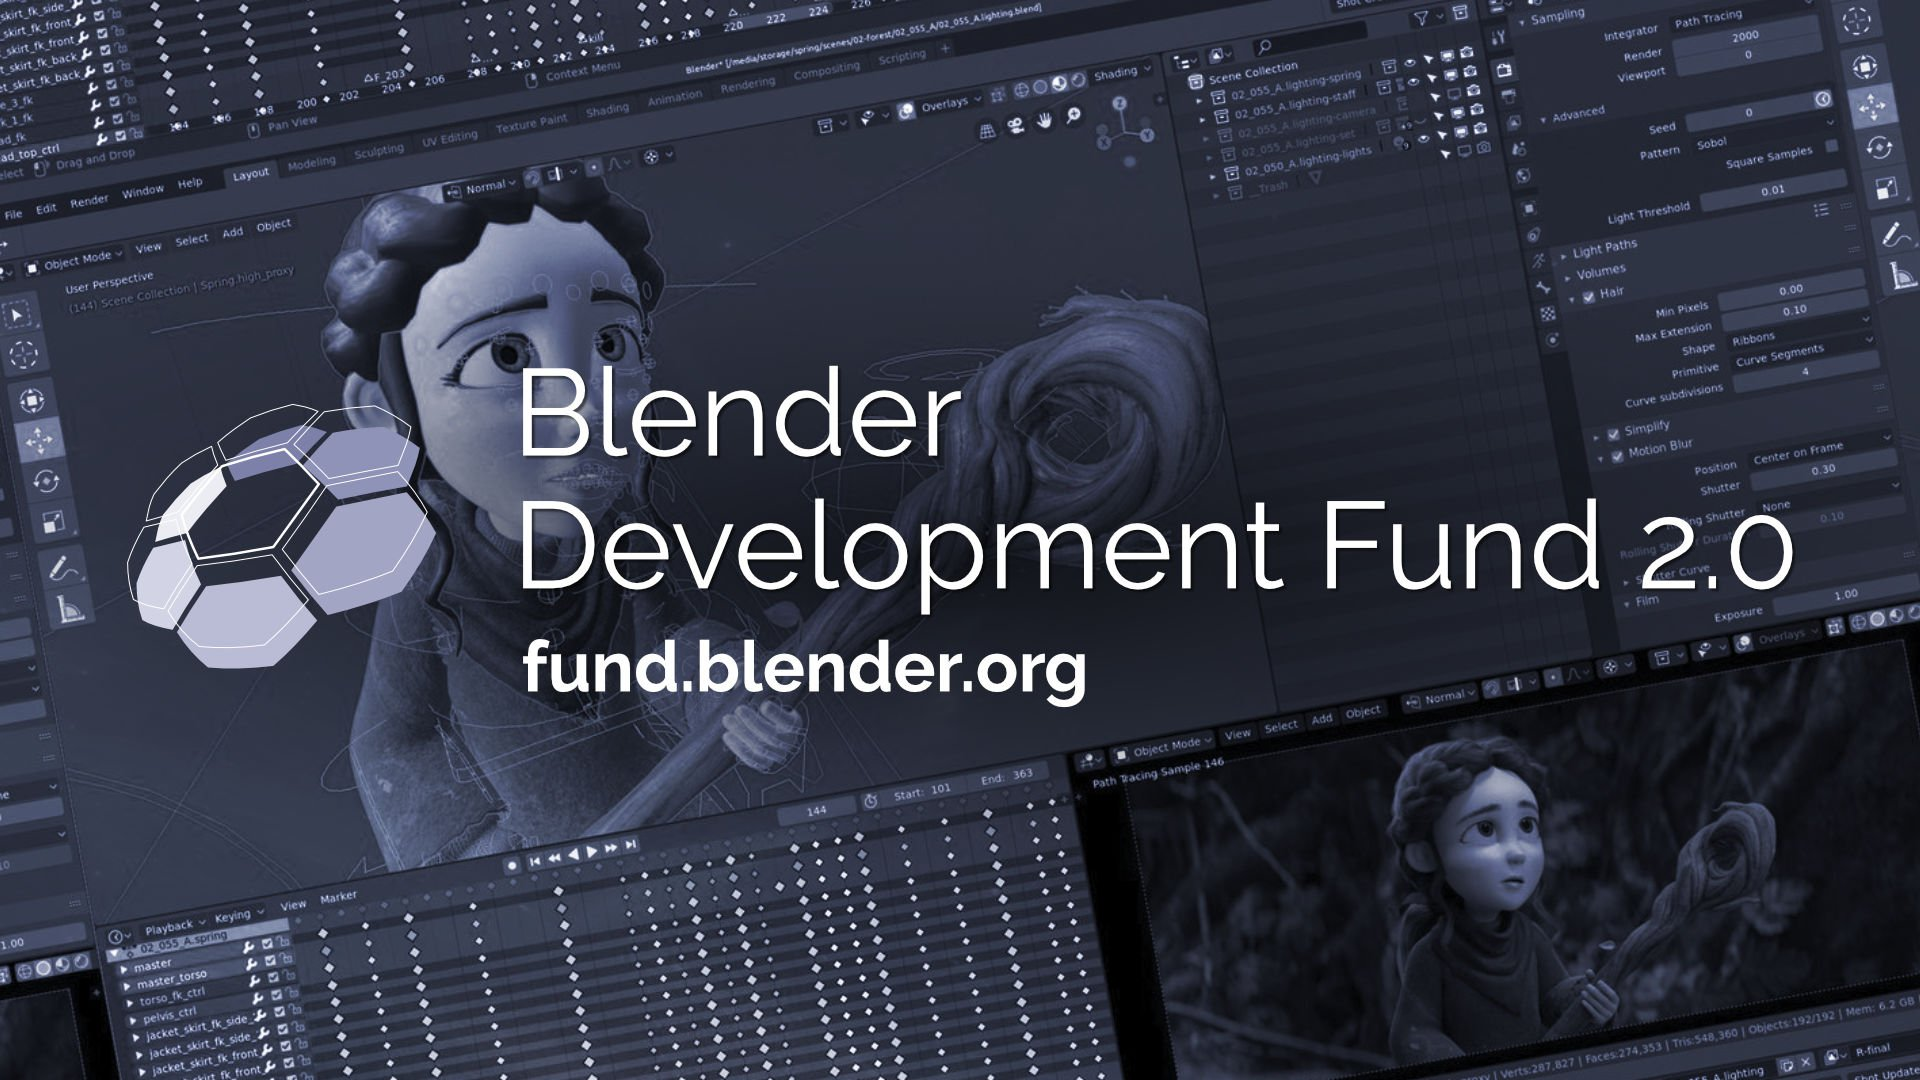 Development Fund - blender org